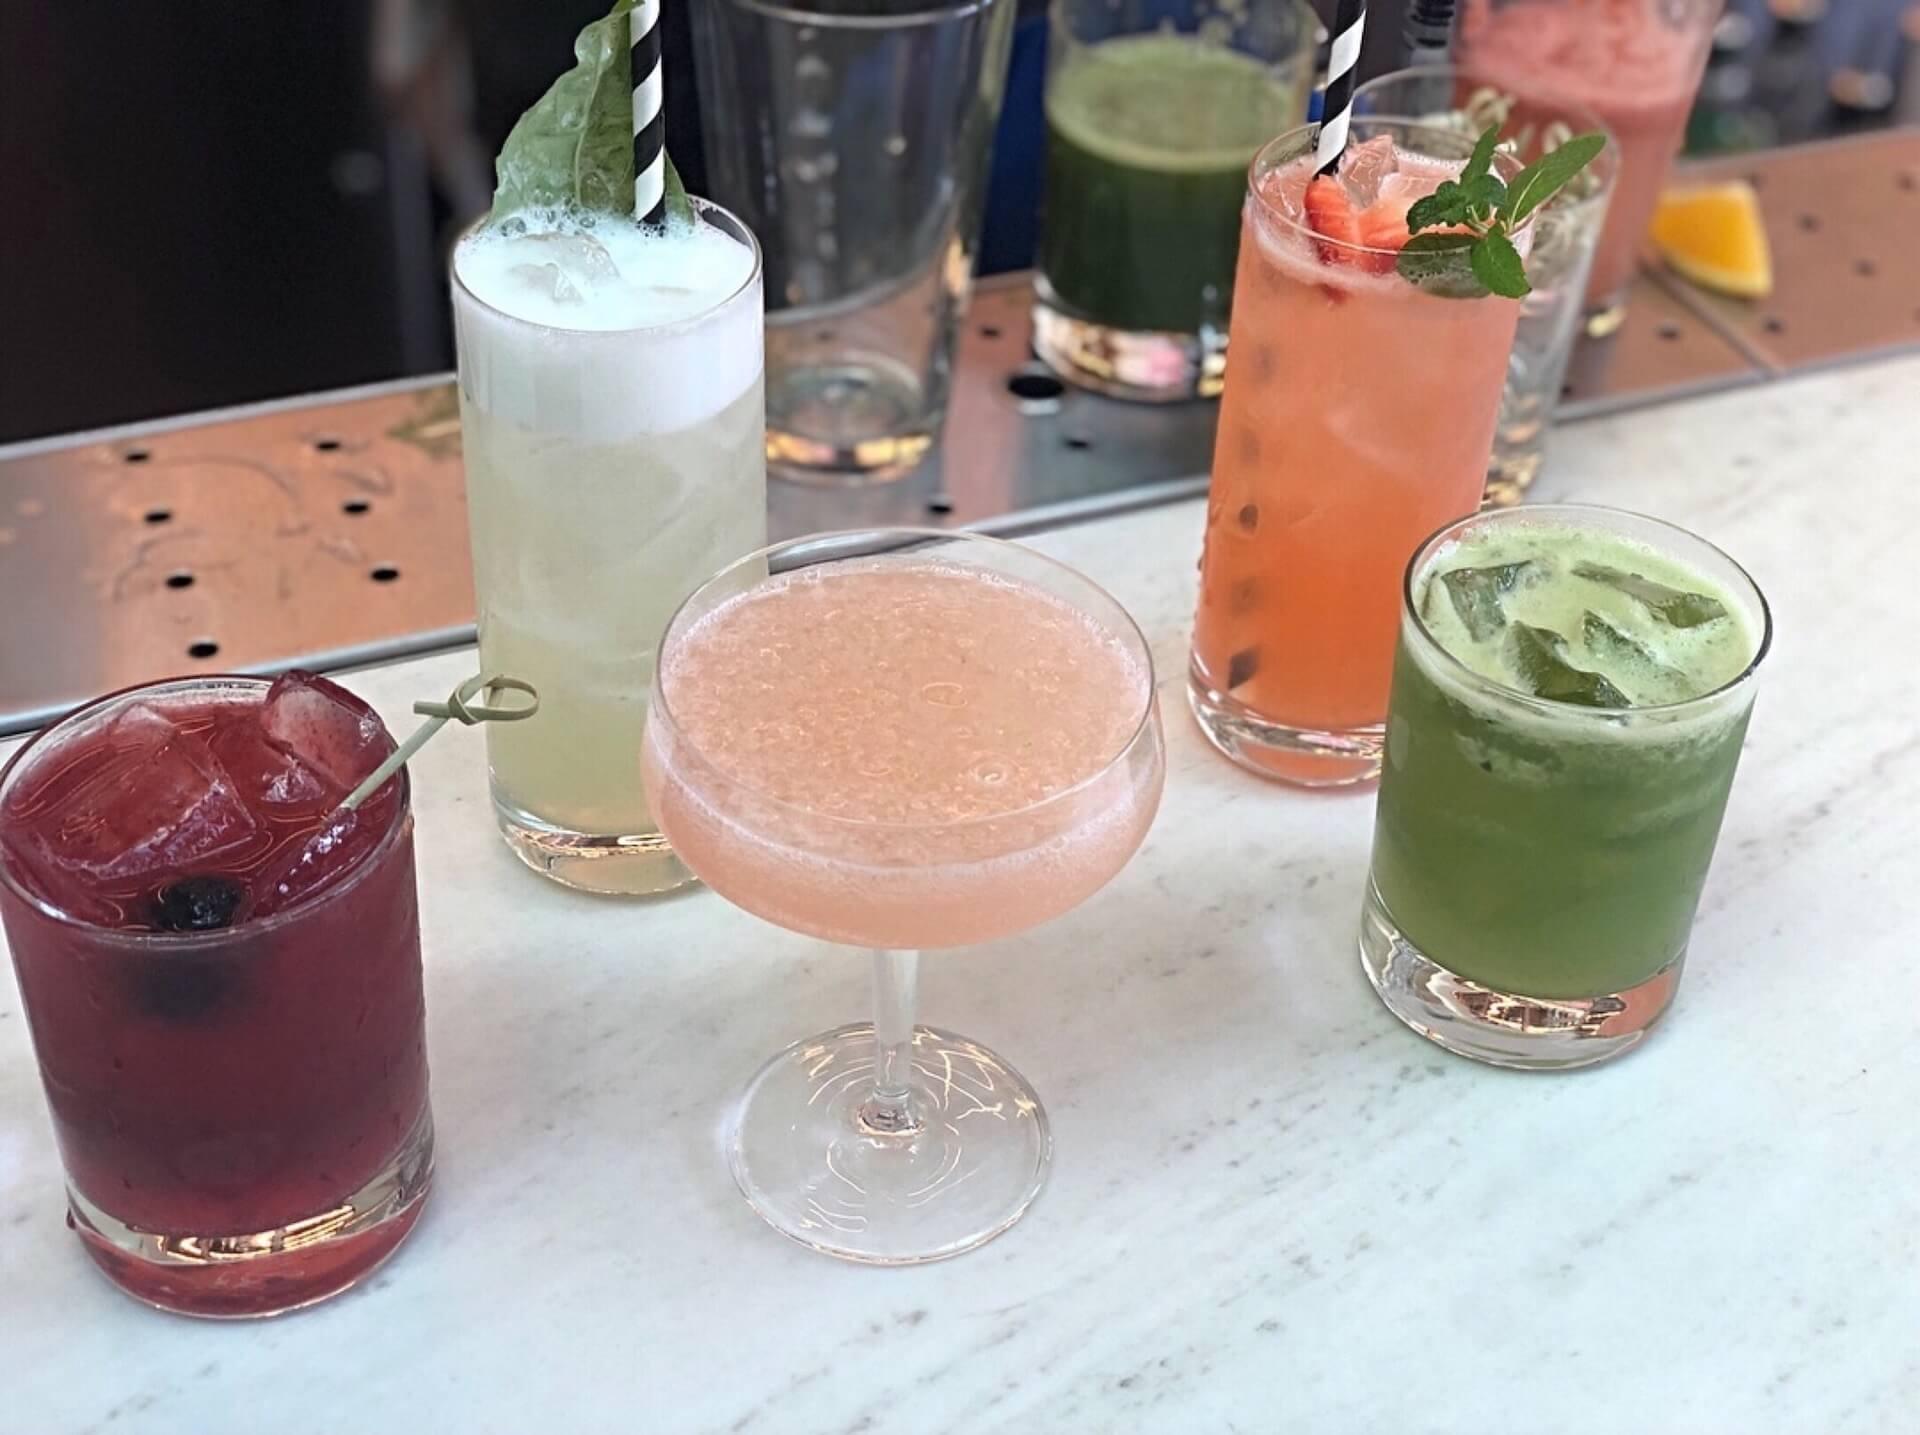 assortment of drinks